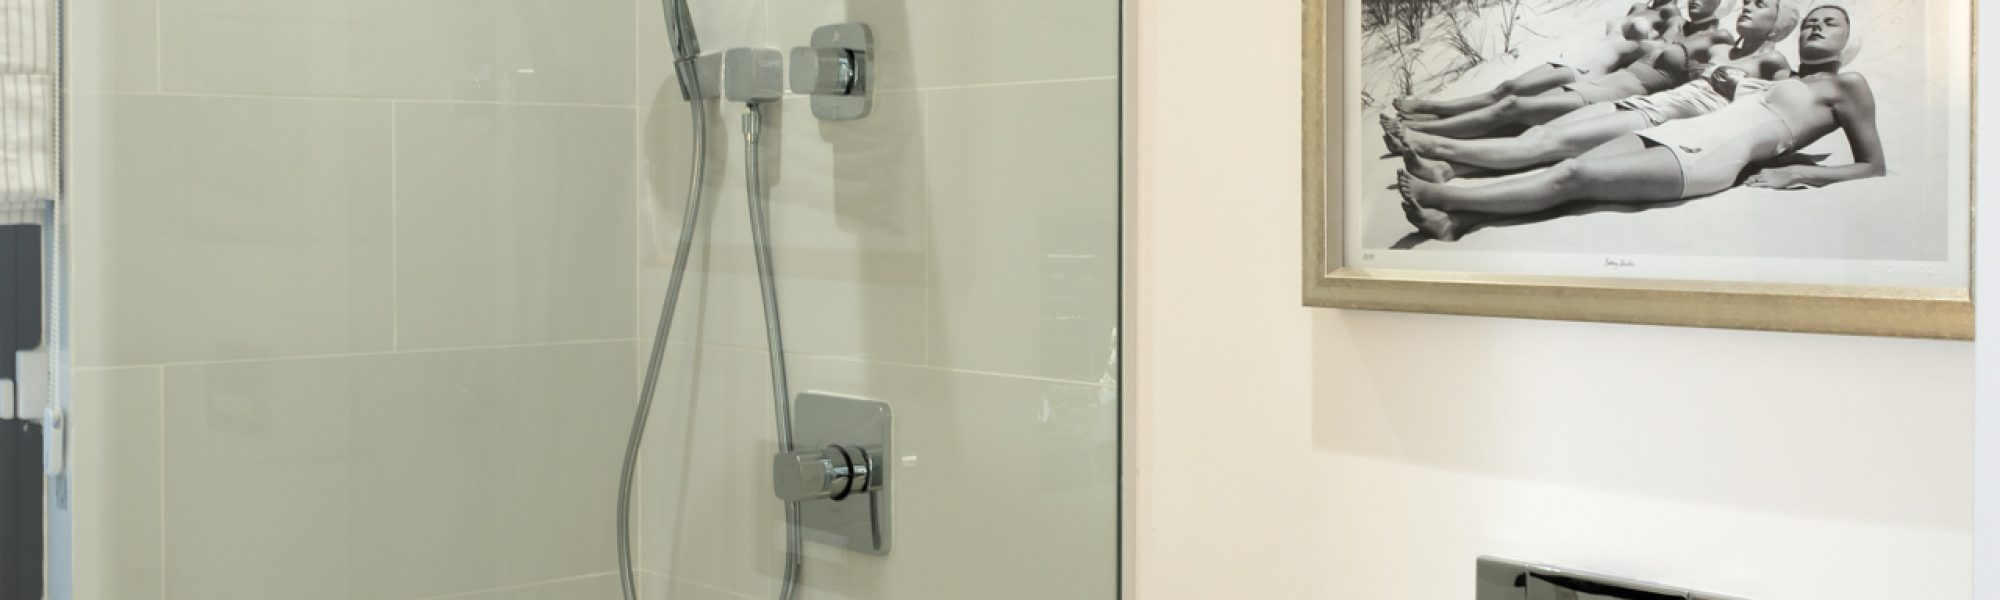 45 bathroom shower low res